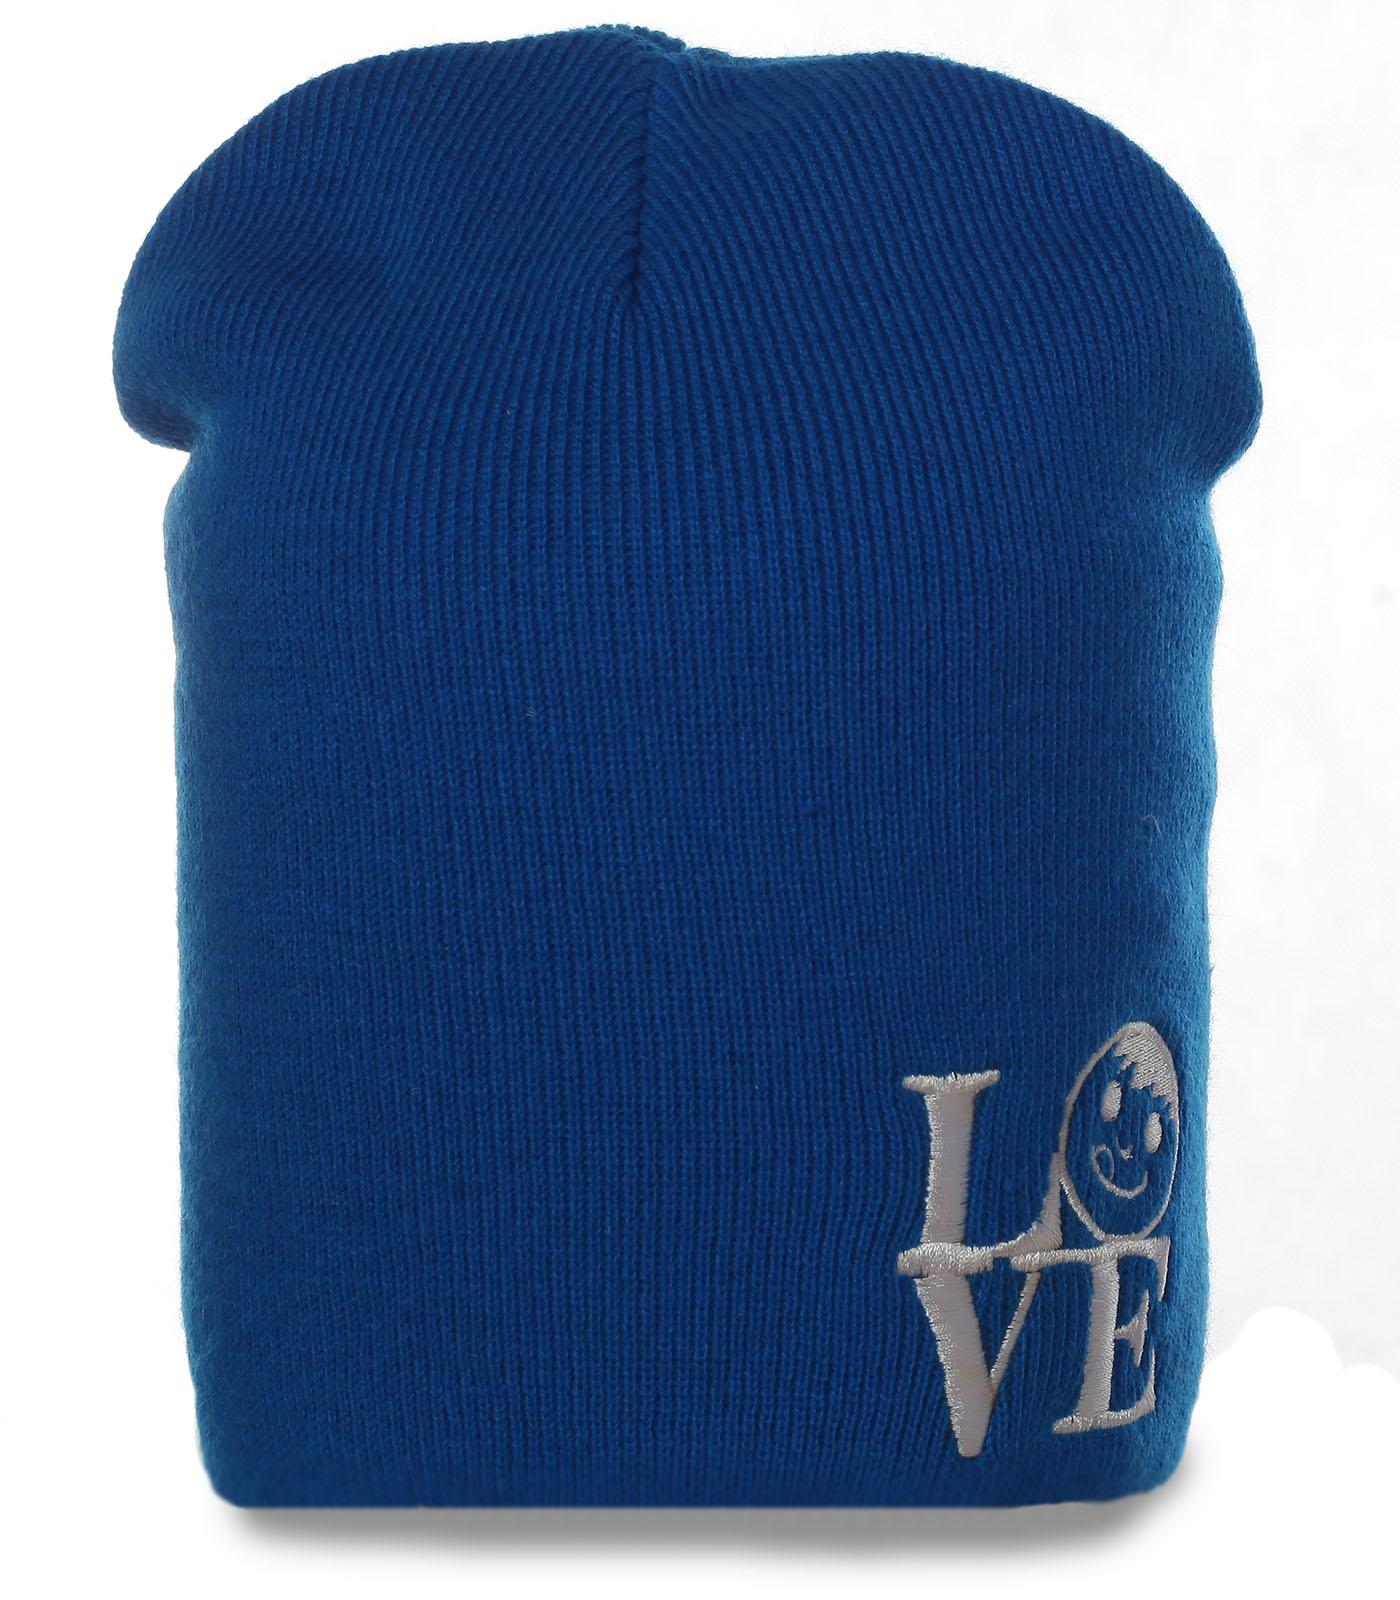 Симпатичная синяя мужская шапка формы бини последняя модная тенденция